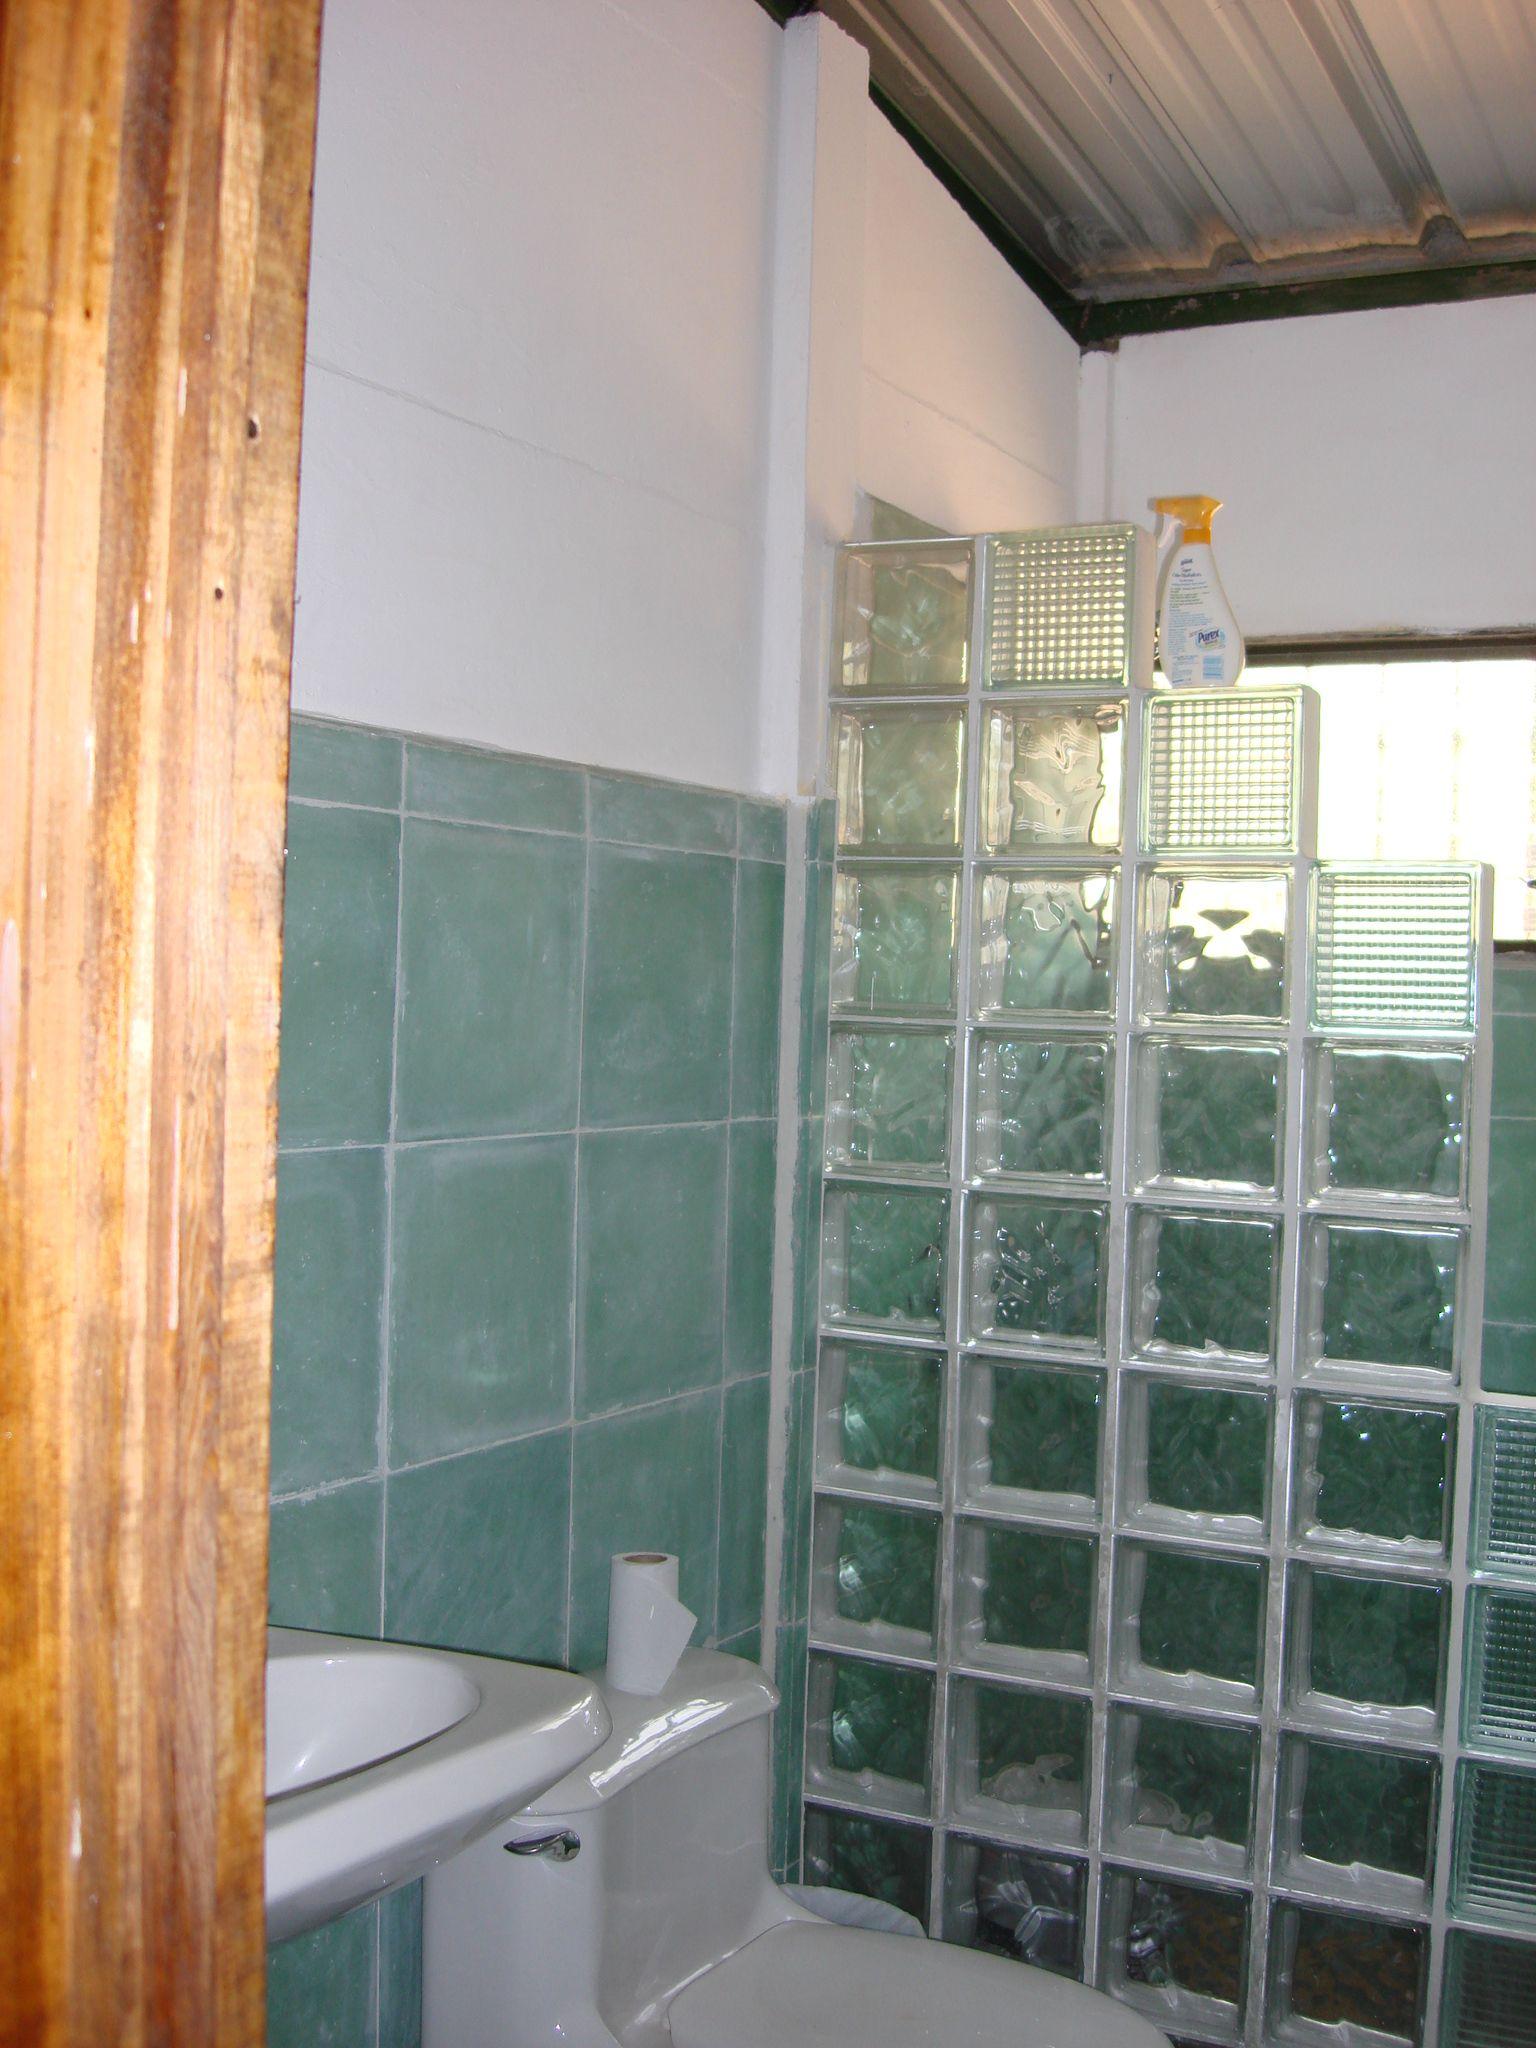 Bloques de vidrio en ducha ideas para ba o bloques de for Cera de hormigon para azulejos de bano